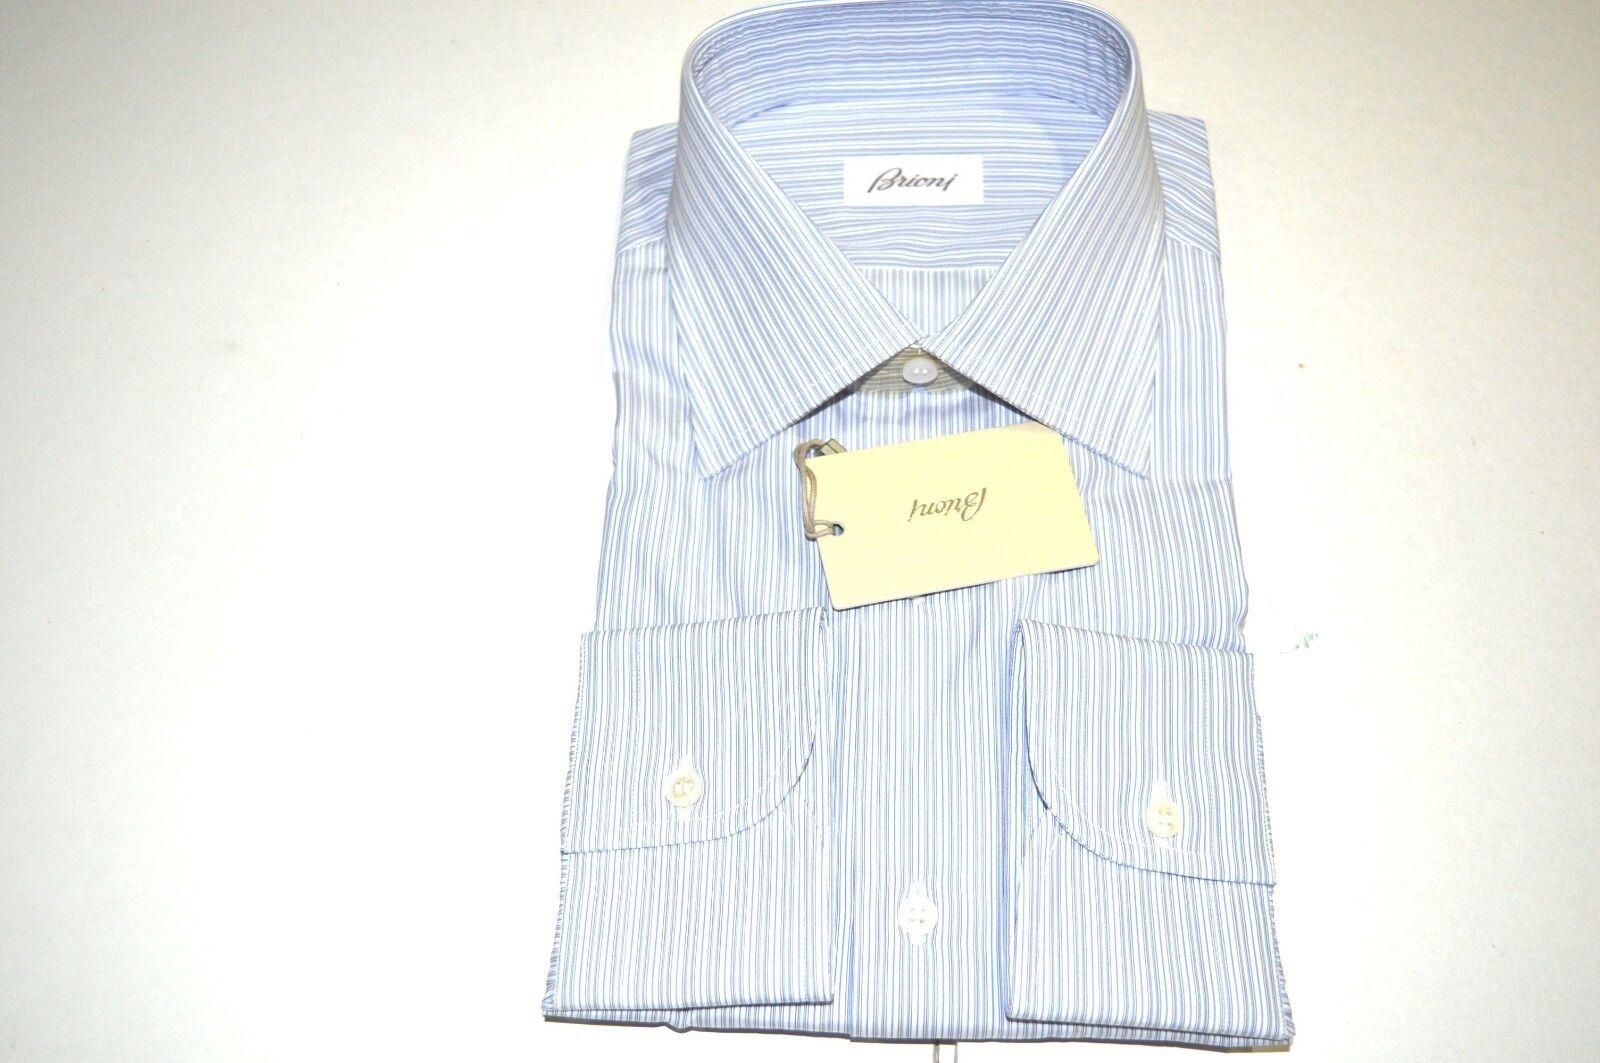 NEW  BRIONI Dress SHIRT 100% Cotton Size 17.75  Us 45 Eu  (Store Code B1)